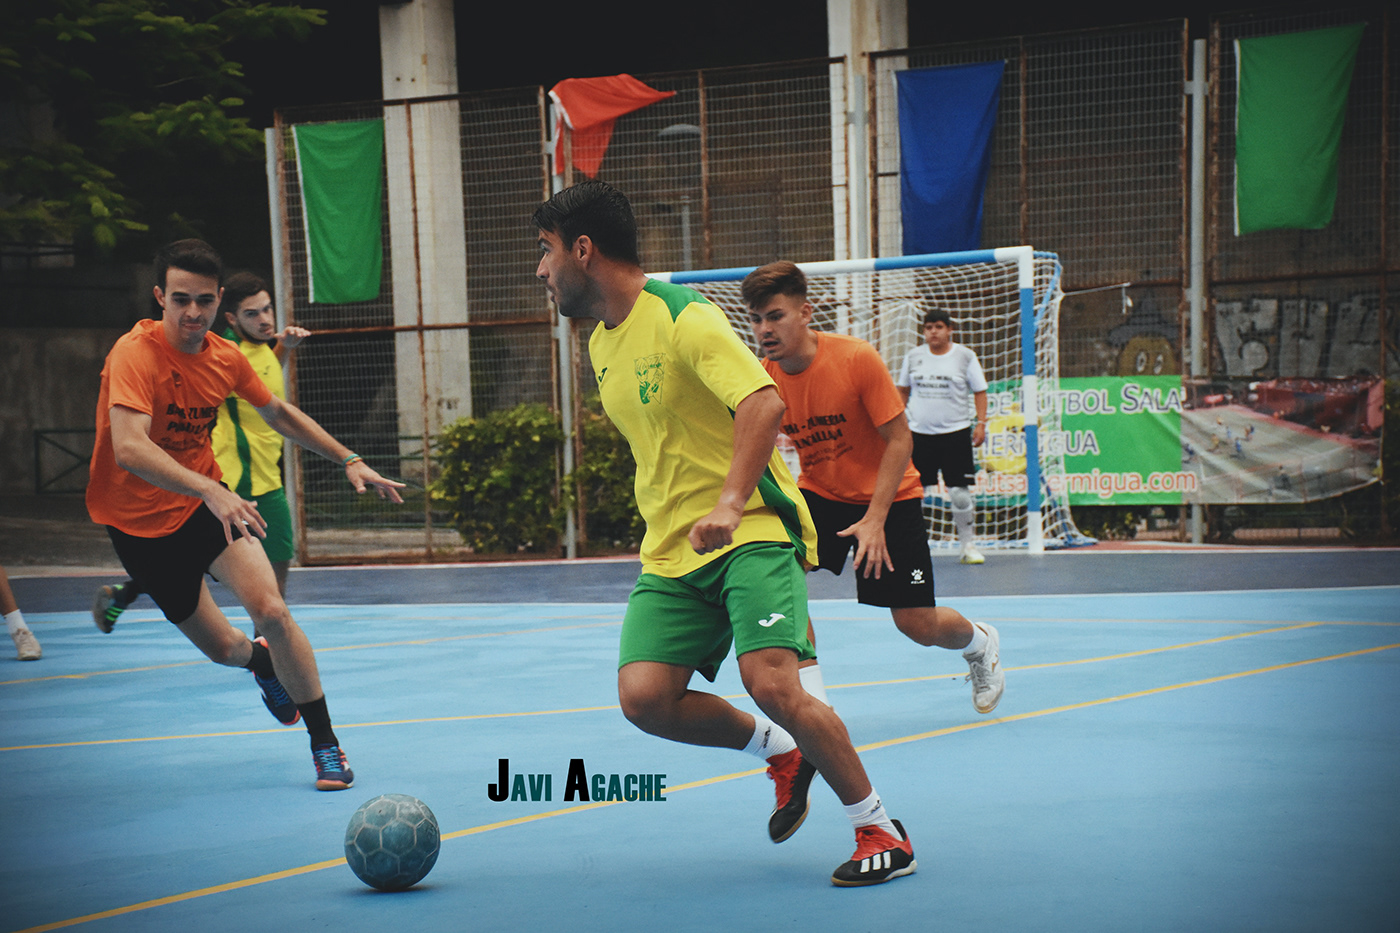 Futsal Hermigua Hermigua Fútbol sala futsal La Gomera El Palmar Tomates Eléctricos Peñón FS